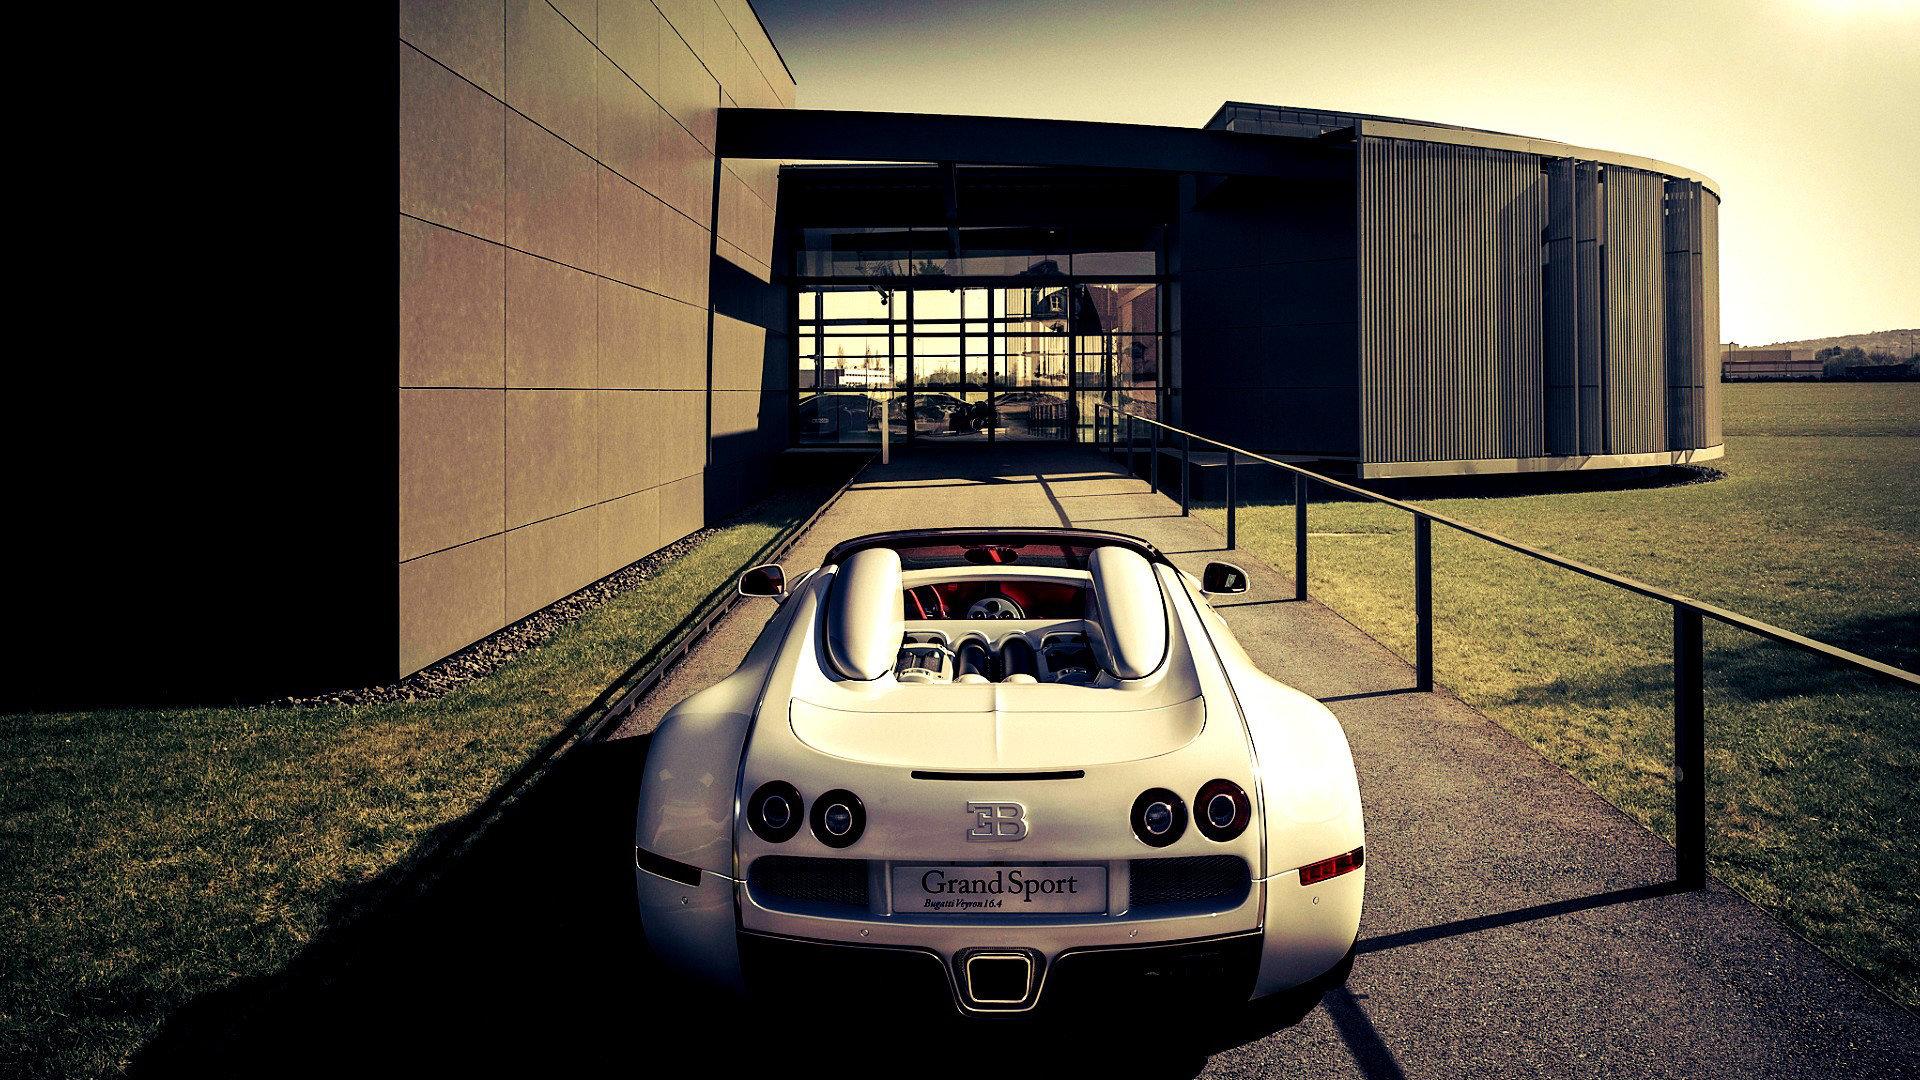 Bugatti Wallpapers 1920x1080 Full Hd 1080p Desktop Backgrounds